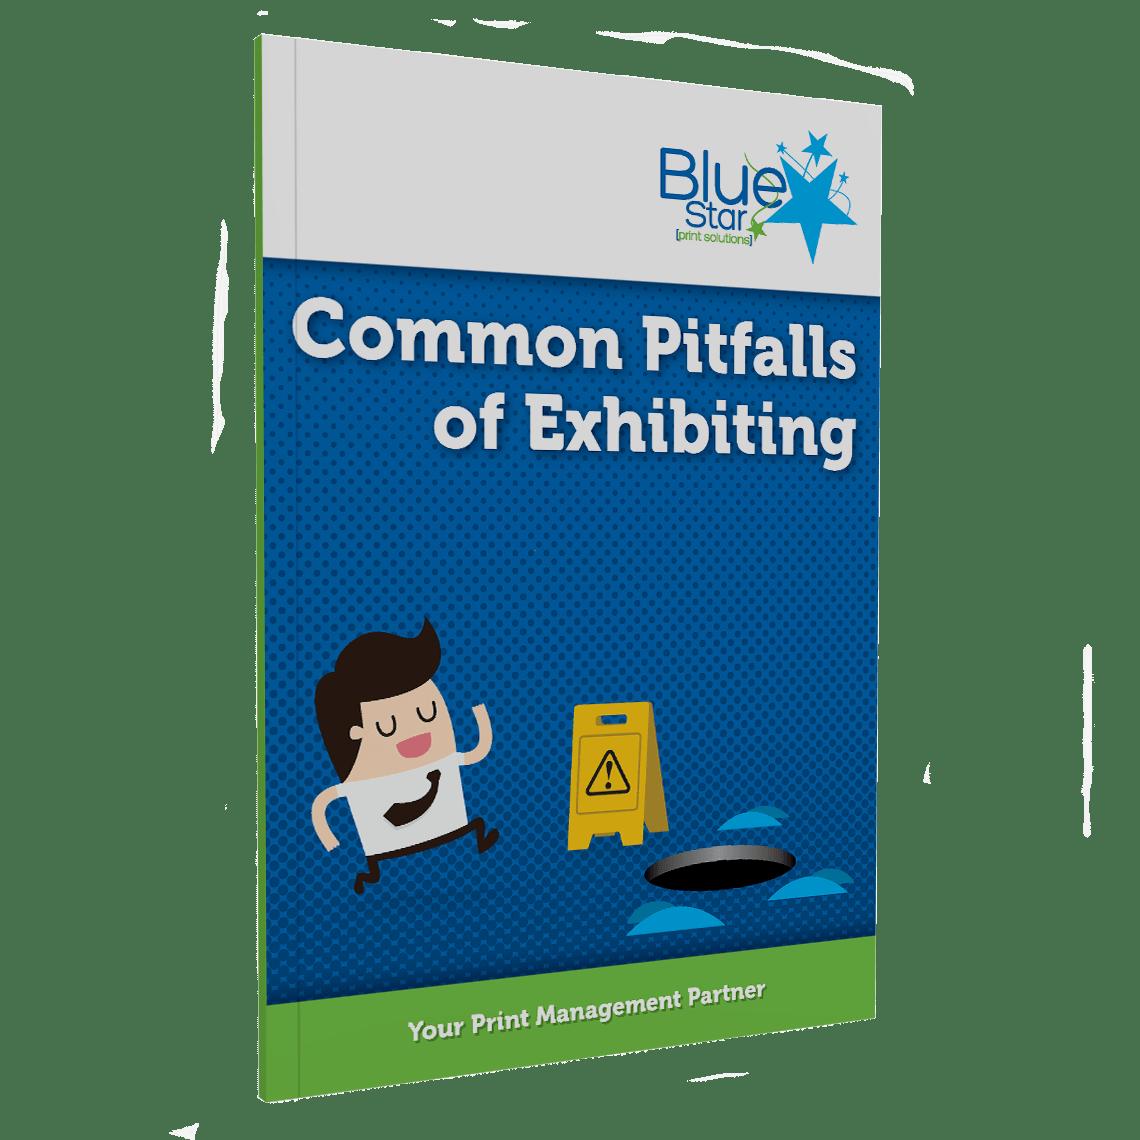 Common Pitfalls of Exhibiting